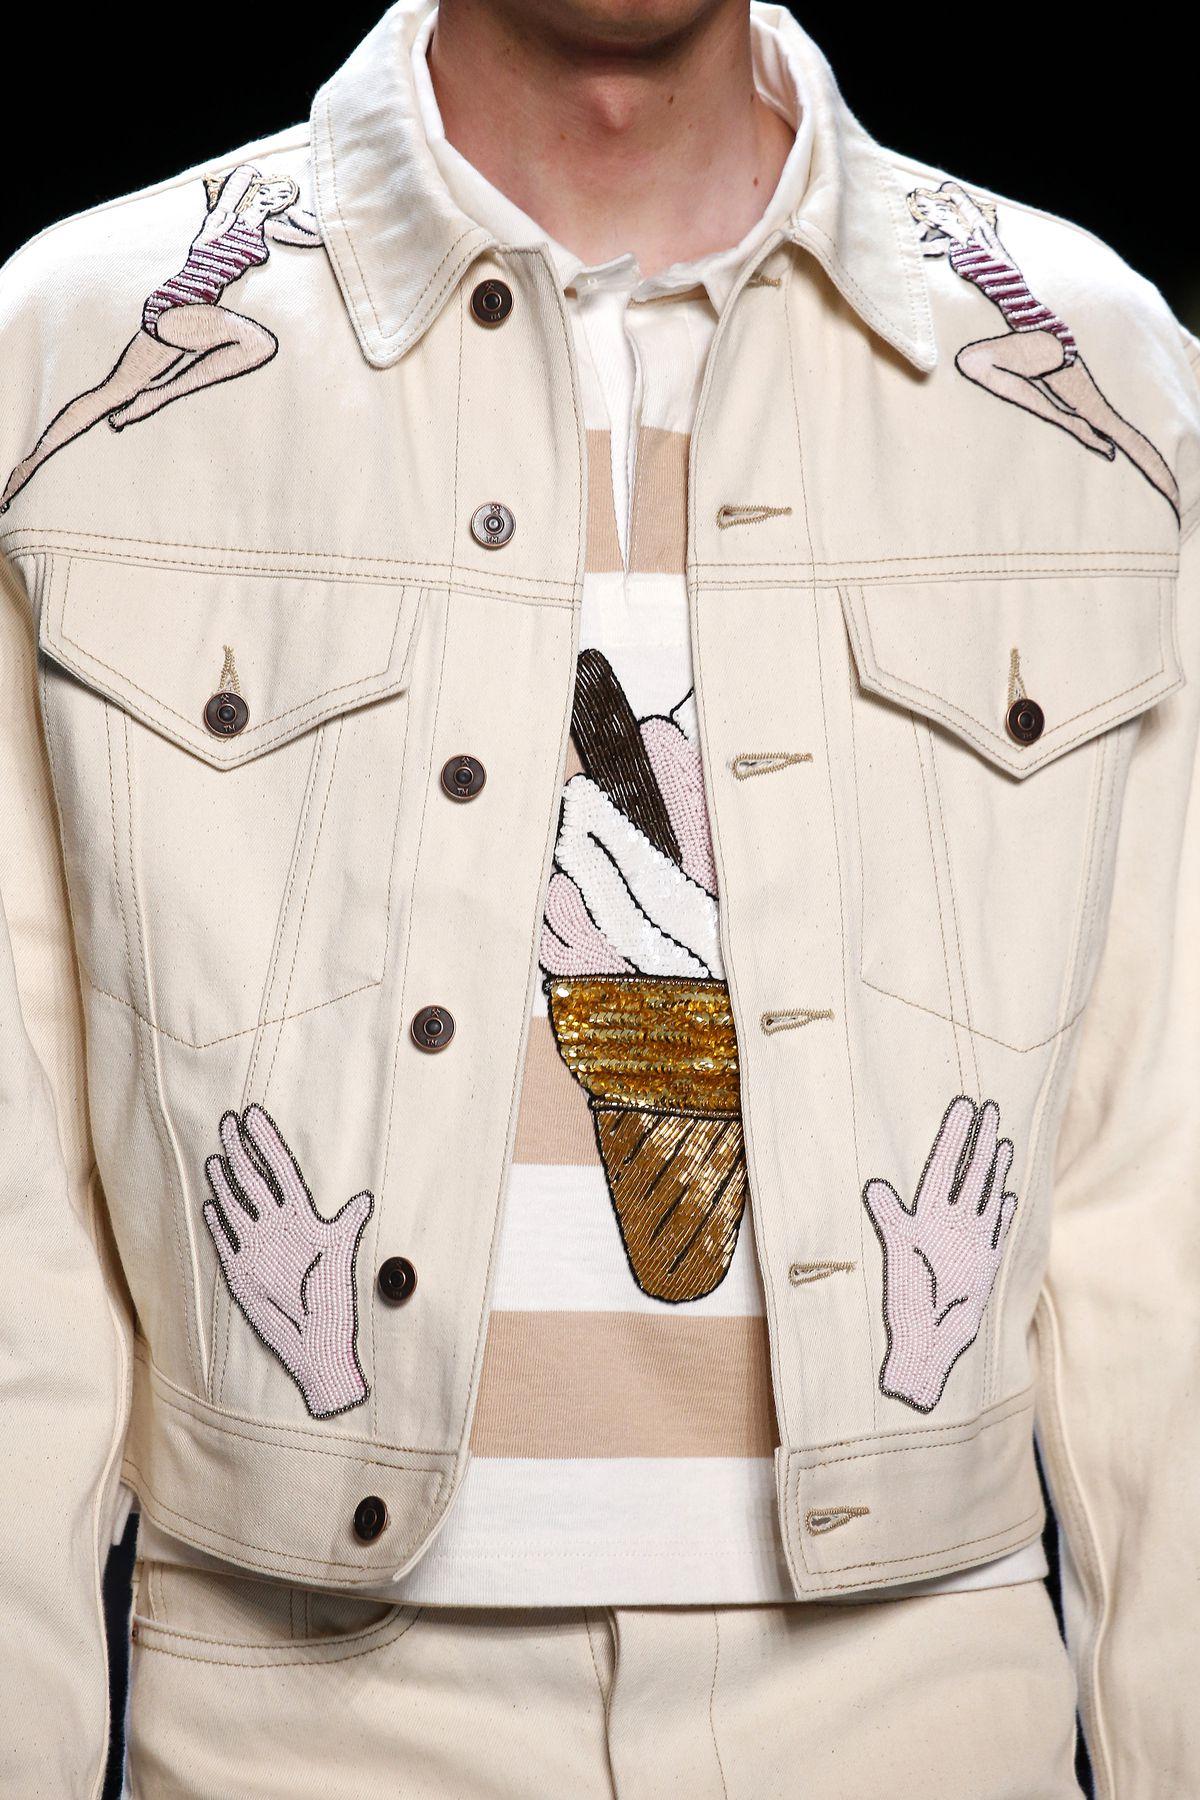 Jacket closeup from Topman's runway show